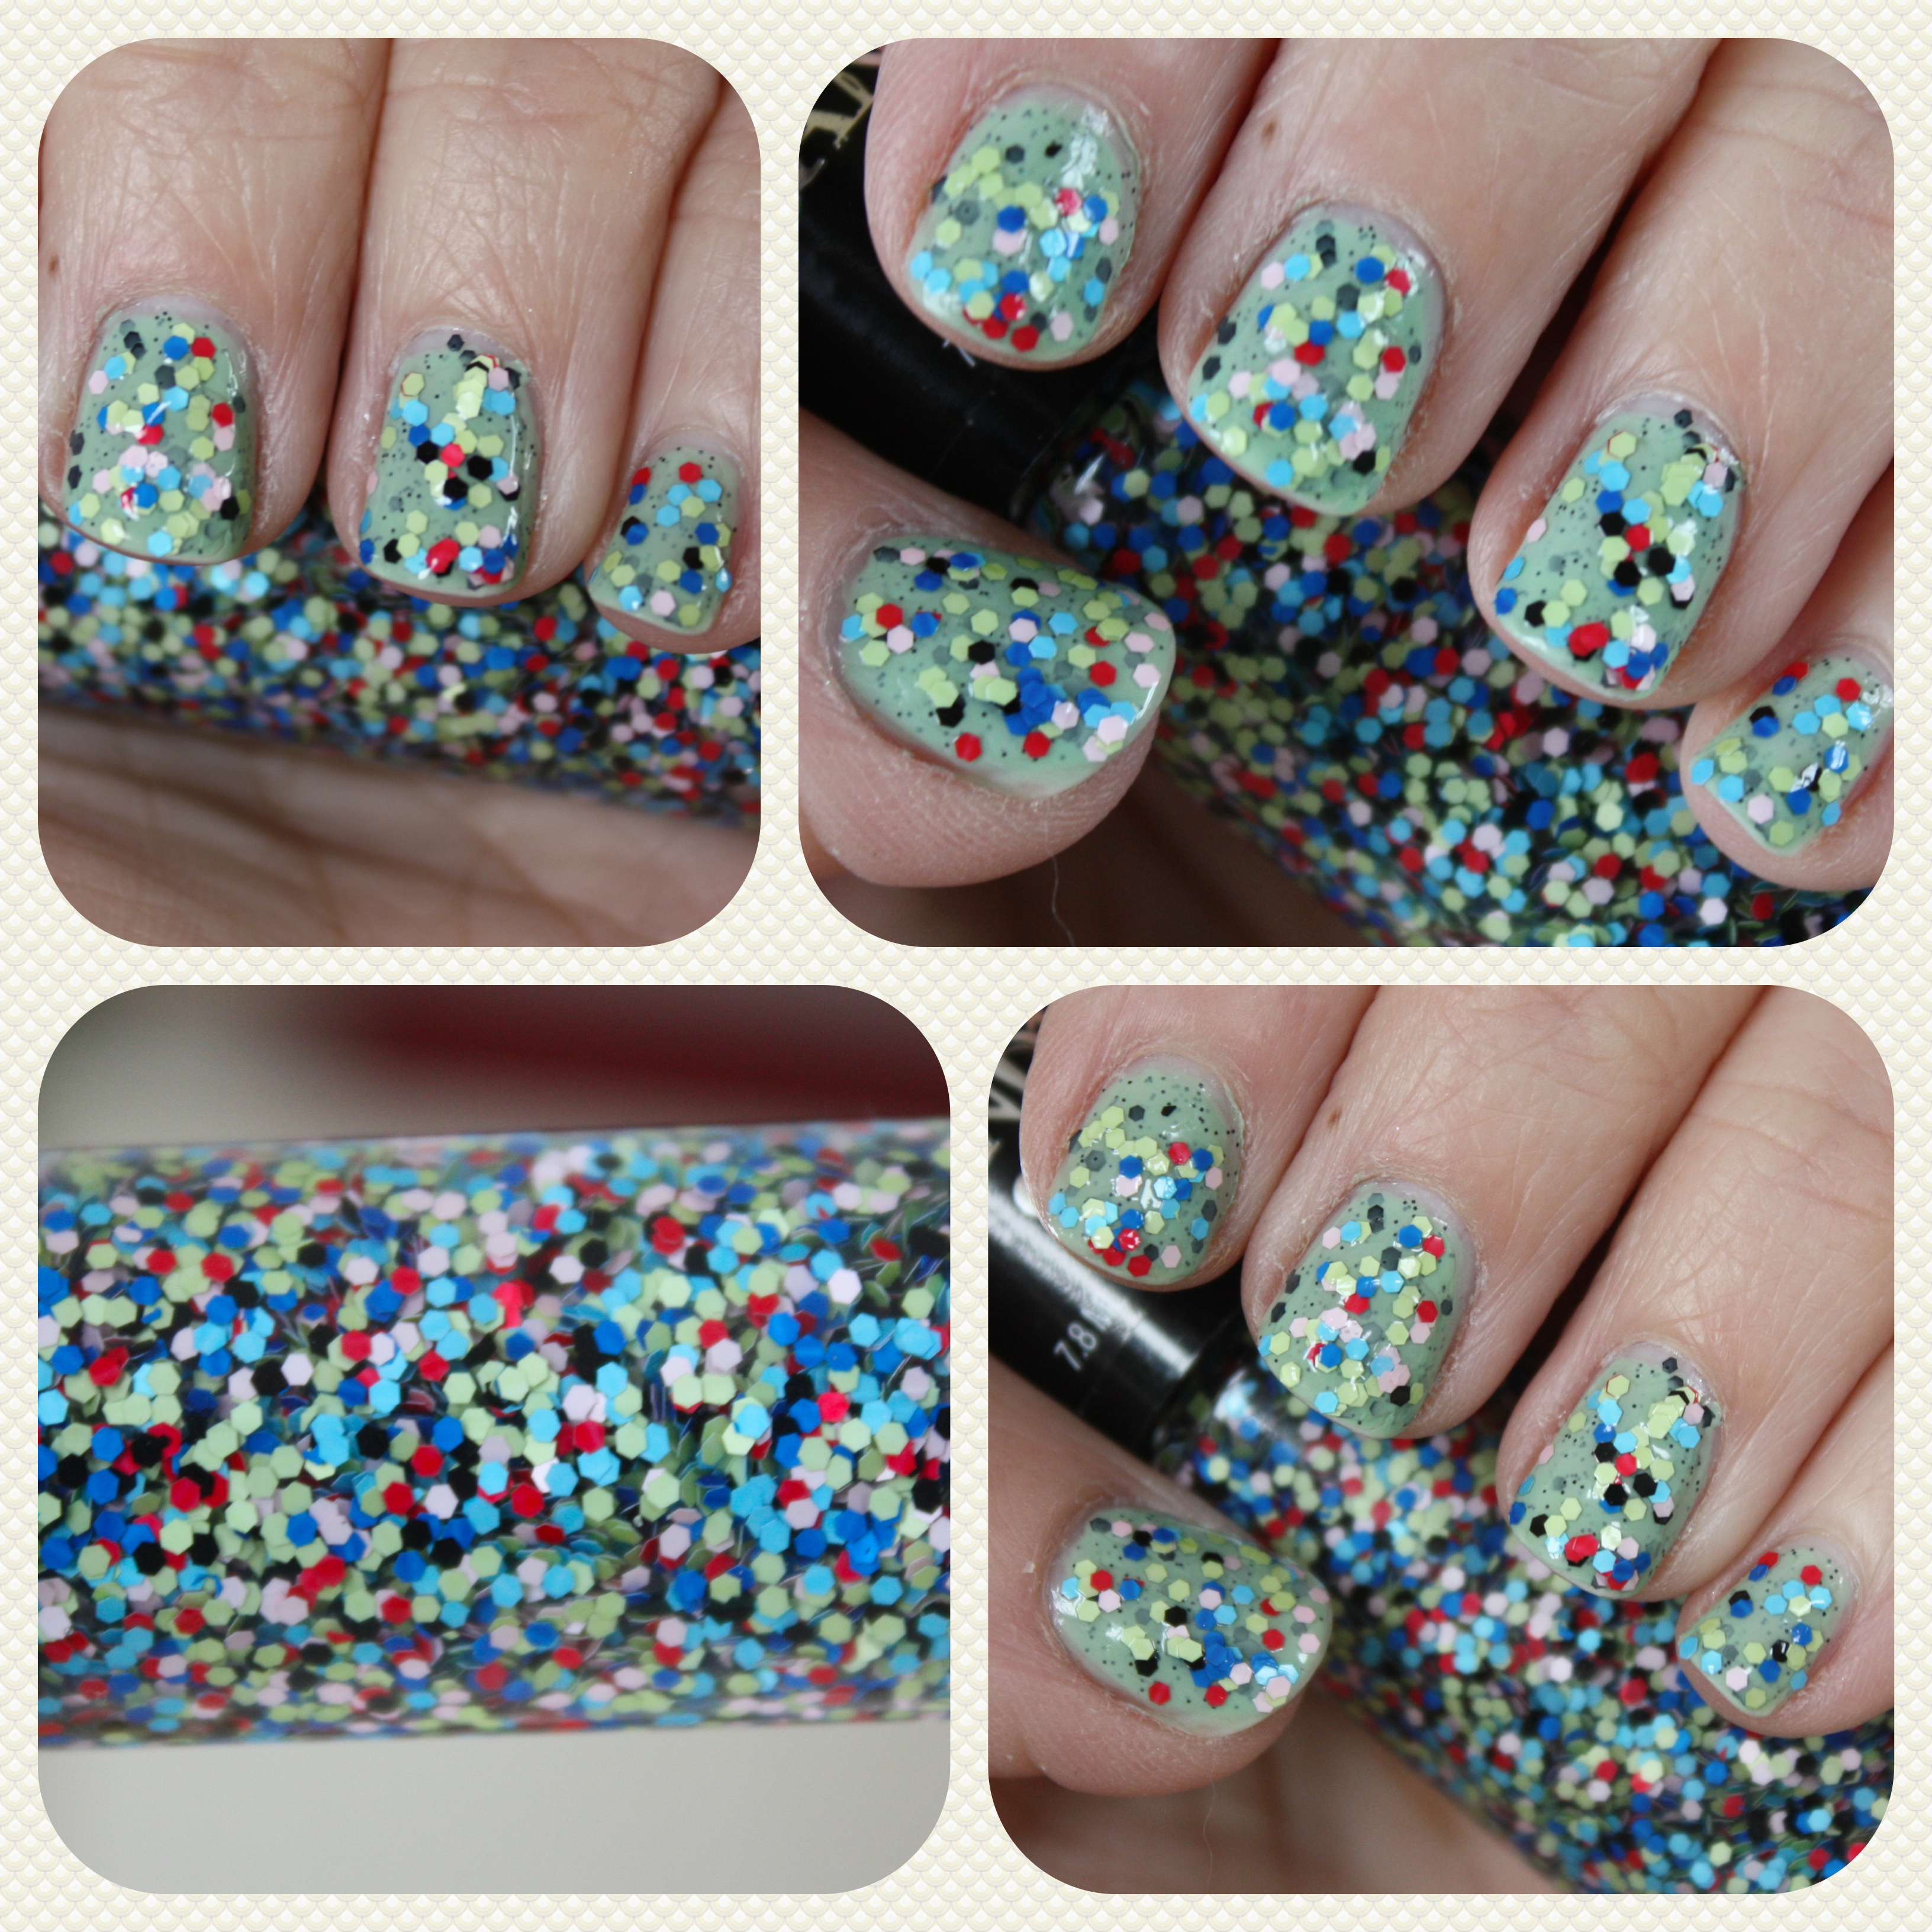 Candy Color Nail Polish: Hard Candy Pop-Arazzi